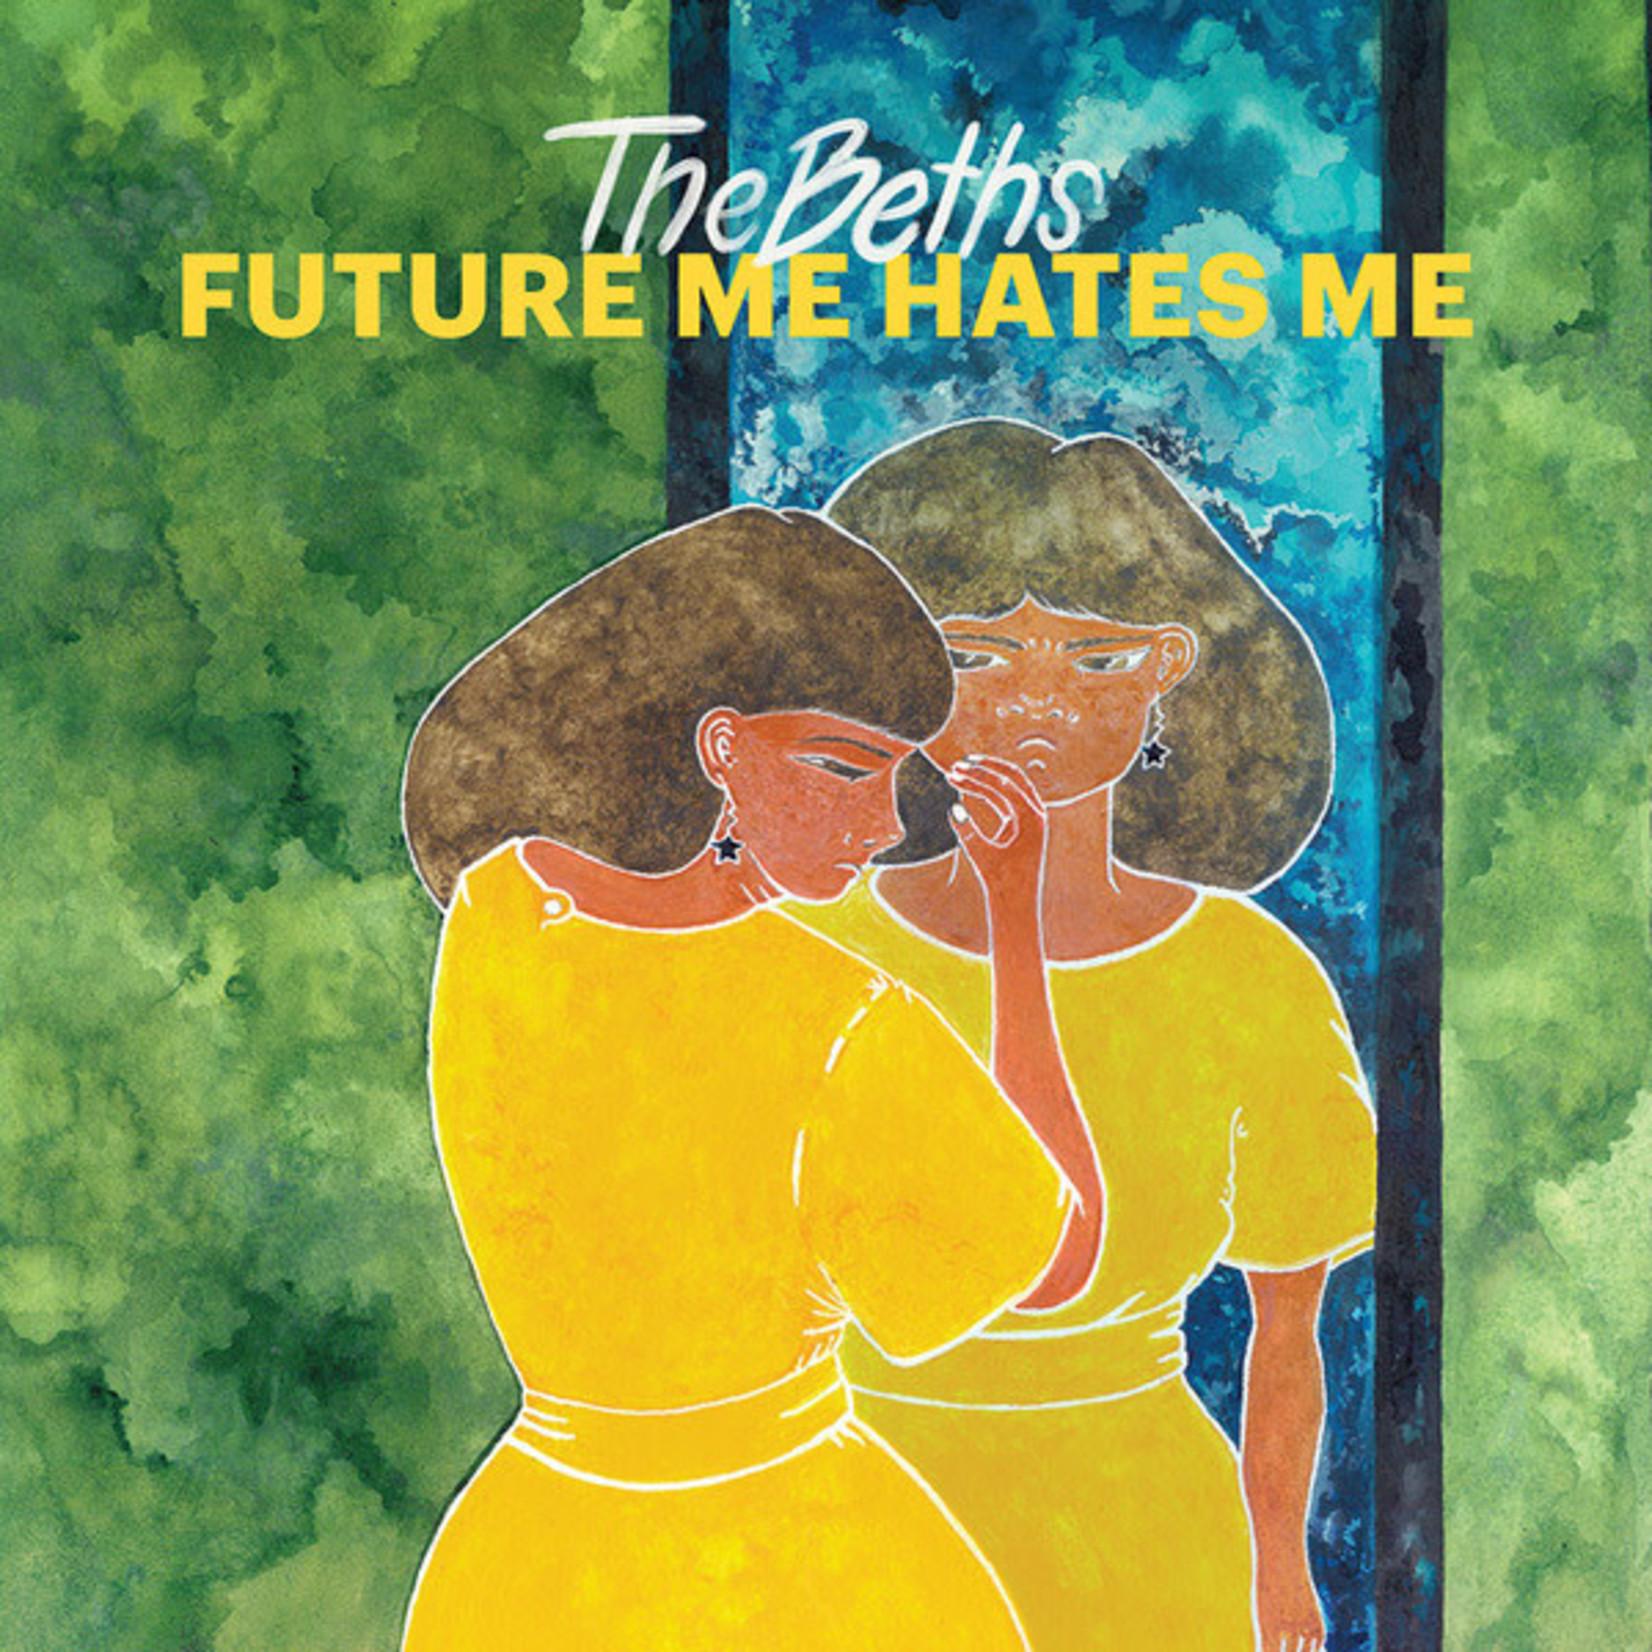 [New] Beths: Future Me Hates Me (green vinyl)